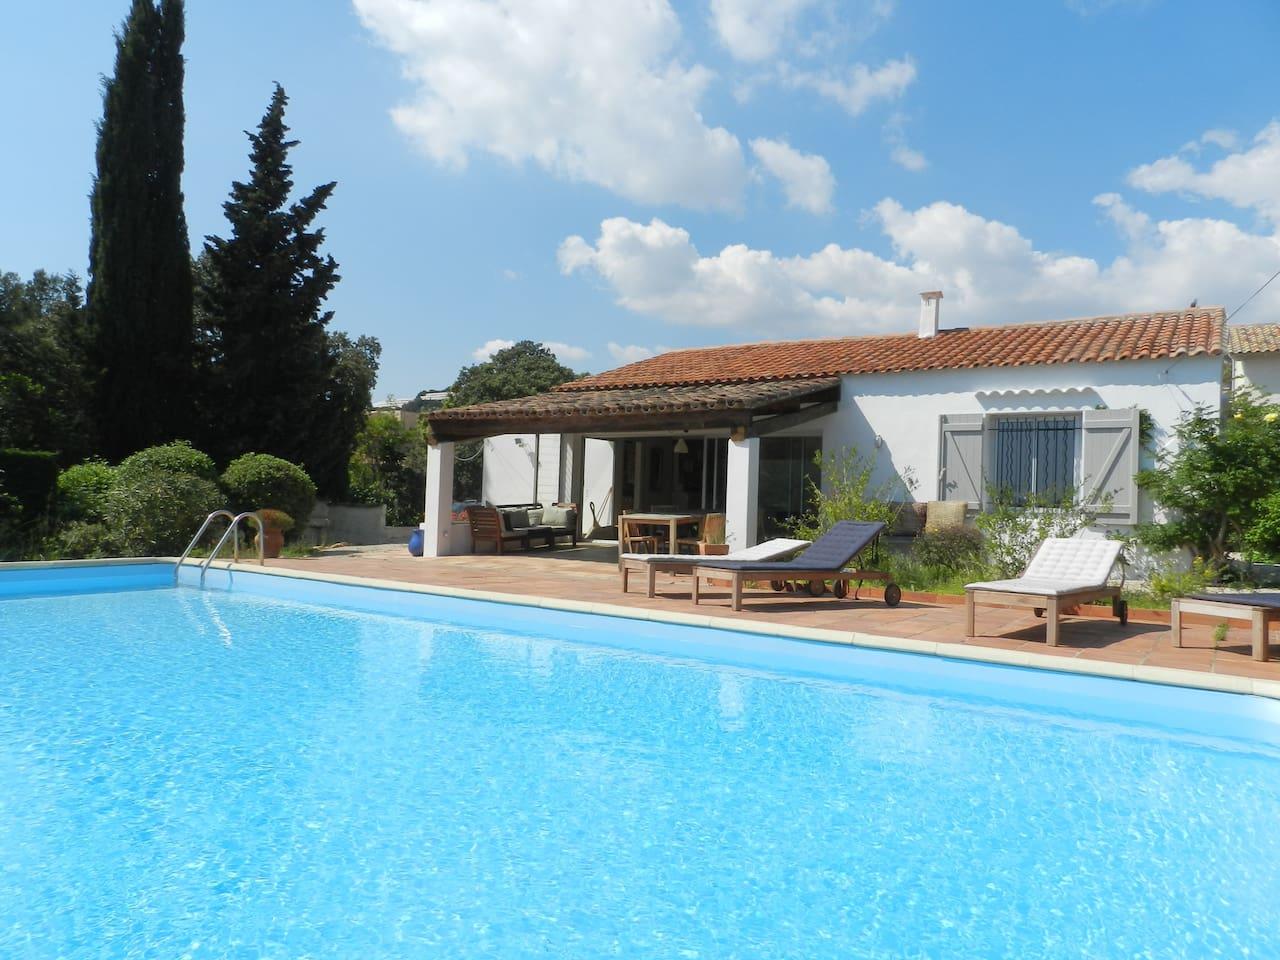 Villa in Bandol - Villas for Rent in Bandol, Provence-Alpes-Côte d ...